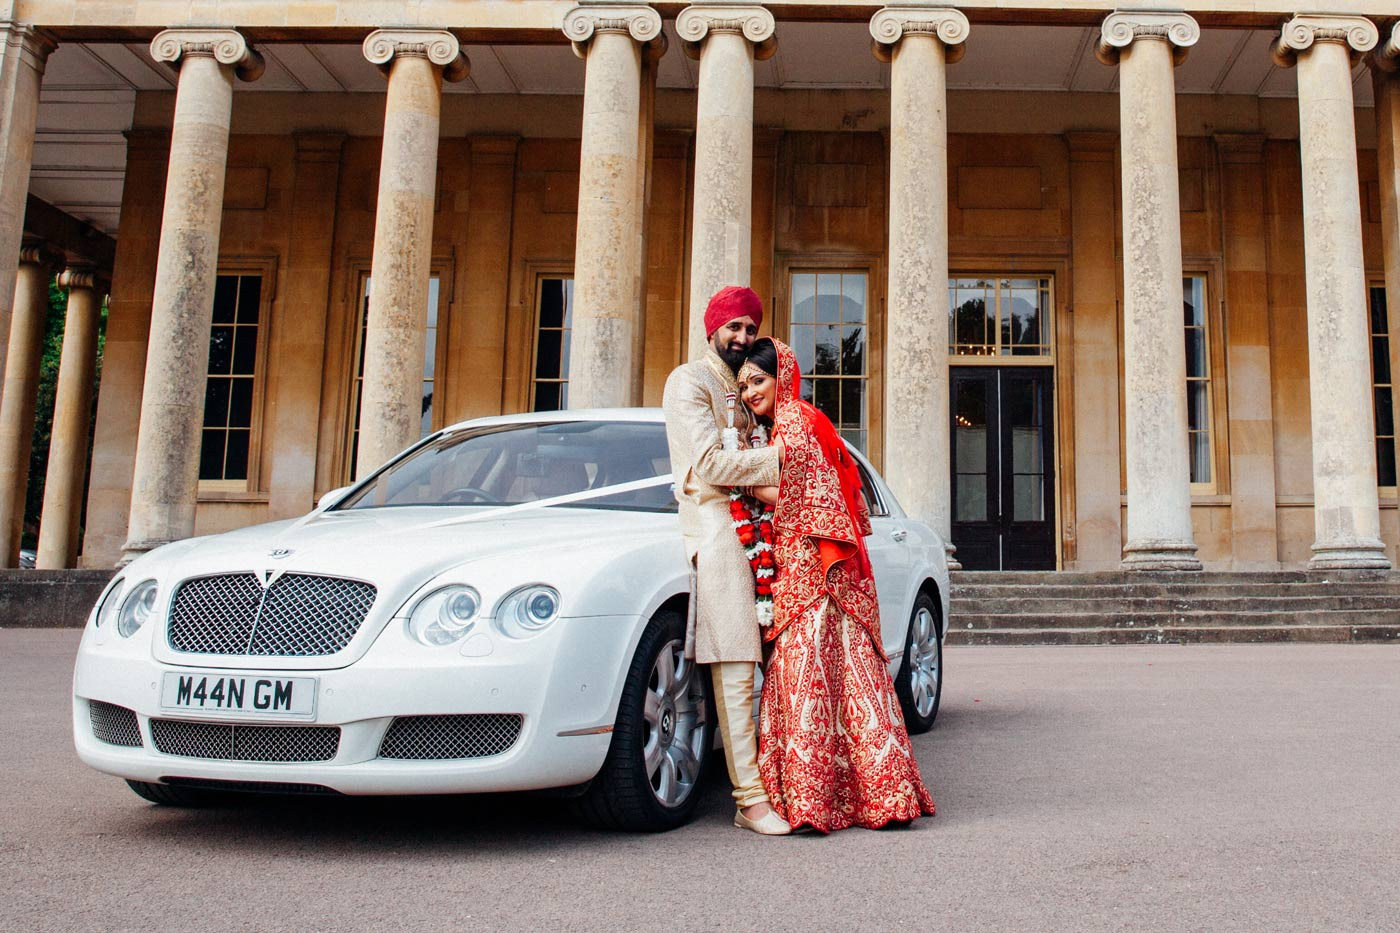 Hindu Wedding Photography & Video at Pittville Pumps // Bal & Rakhee